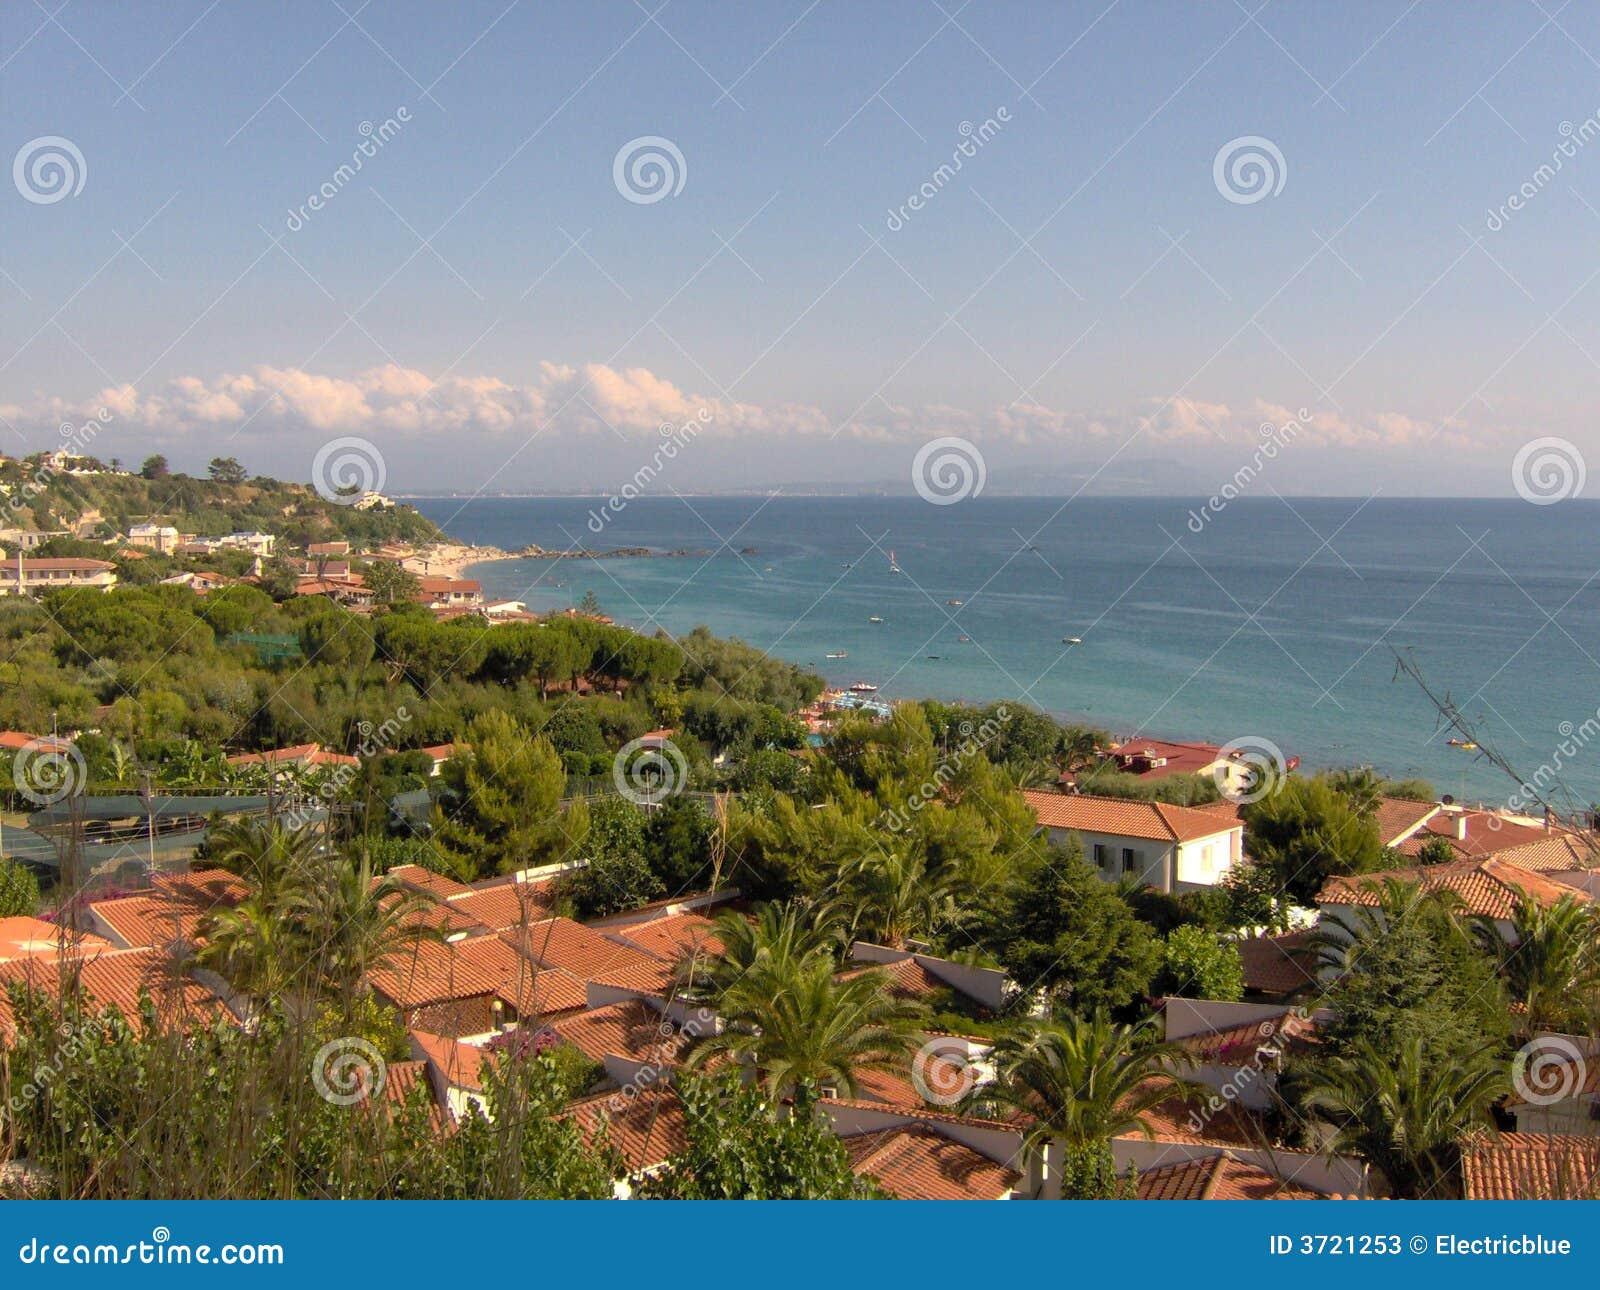 Beautiful coastal location